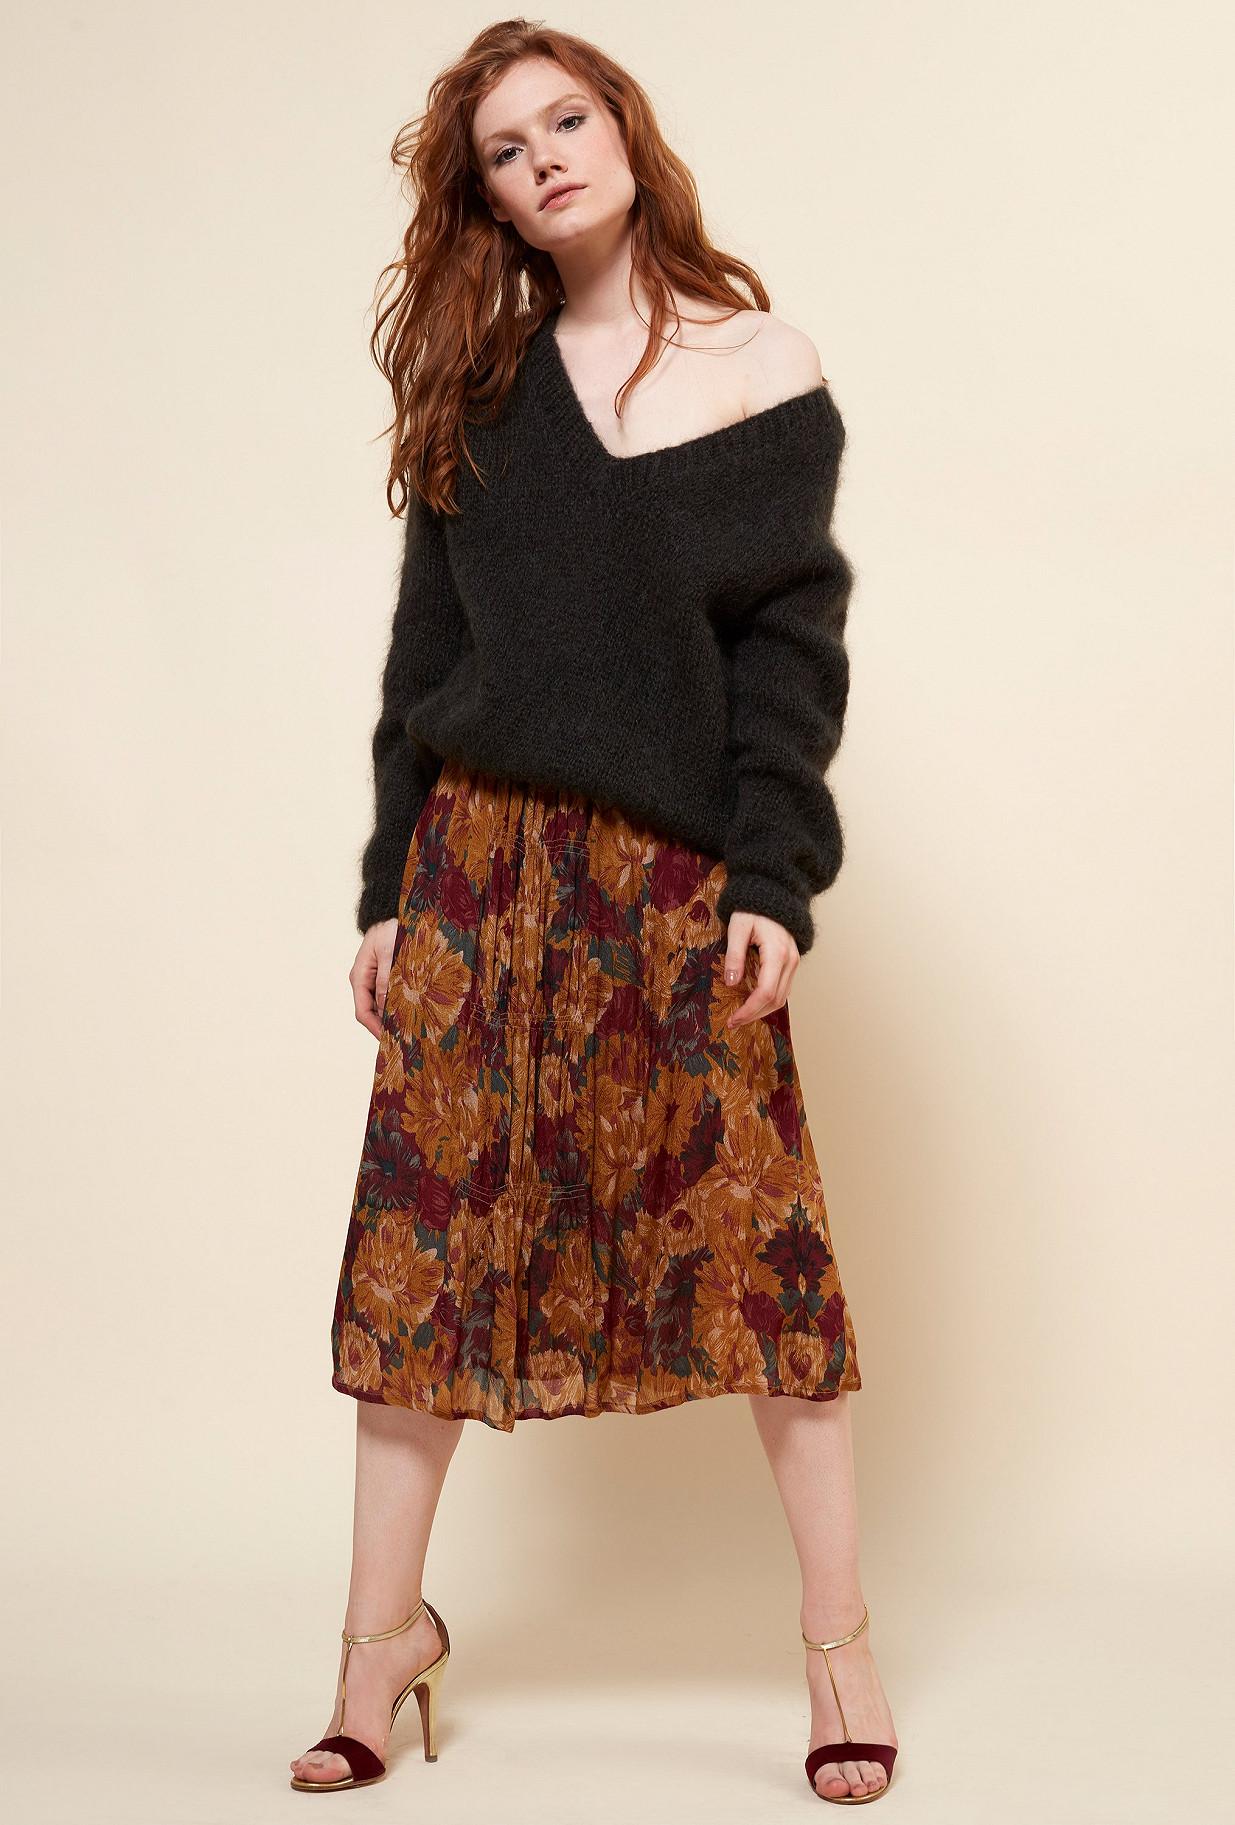 Khaki Knit Juverny